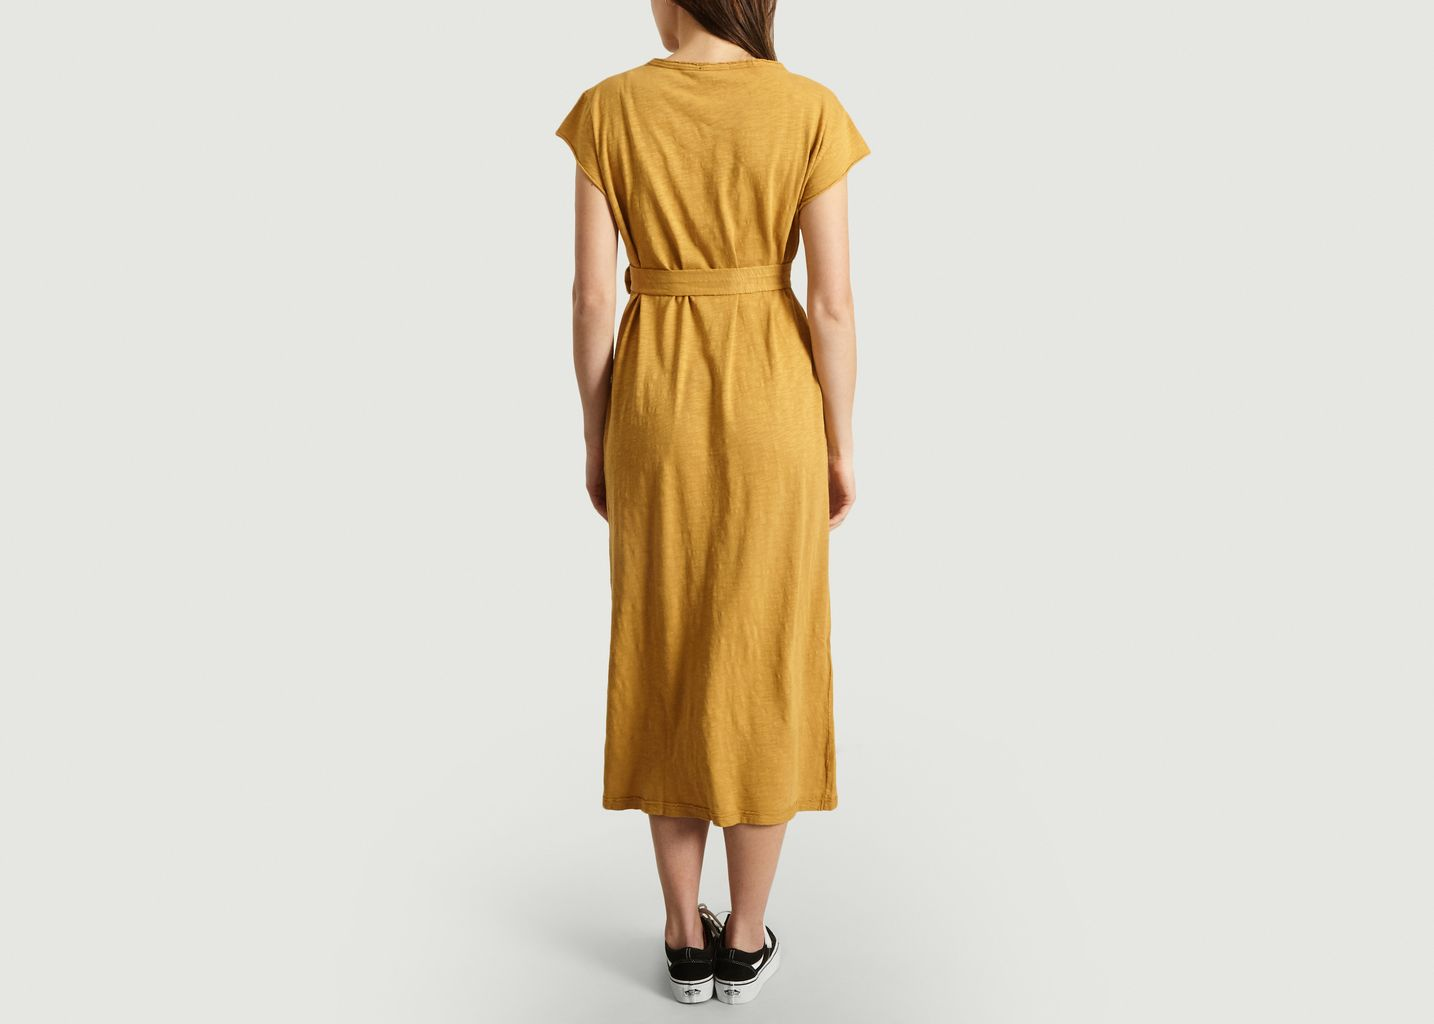 Robe Midi Bysapick - American Vintage